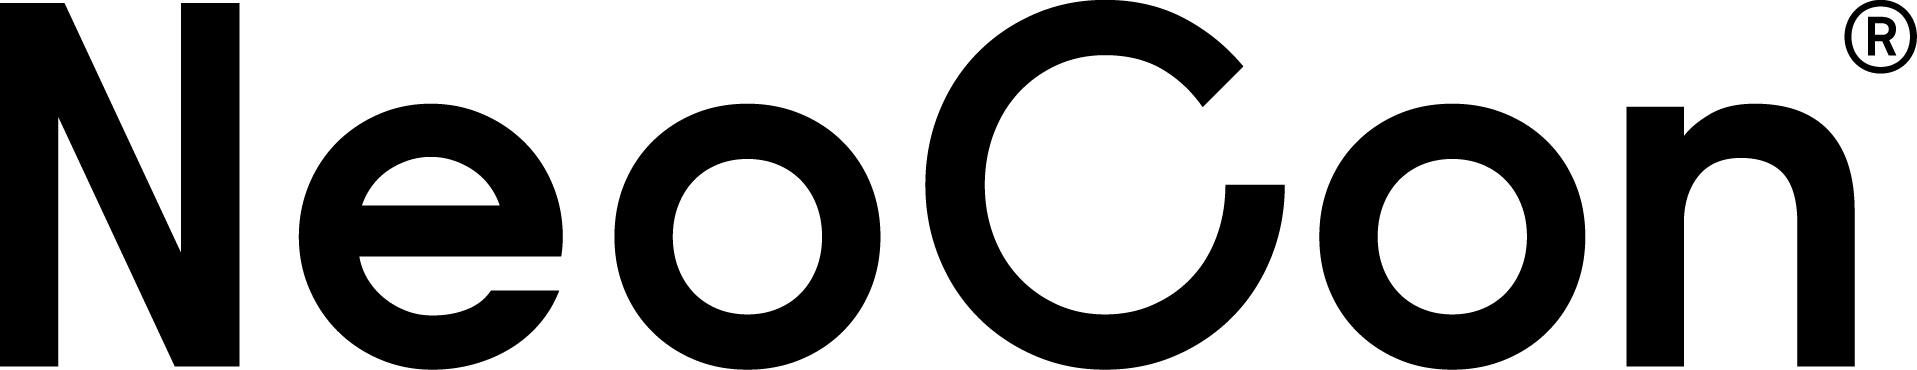 NeoCon-Registered-print-black